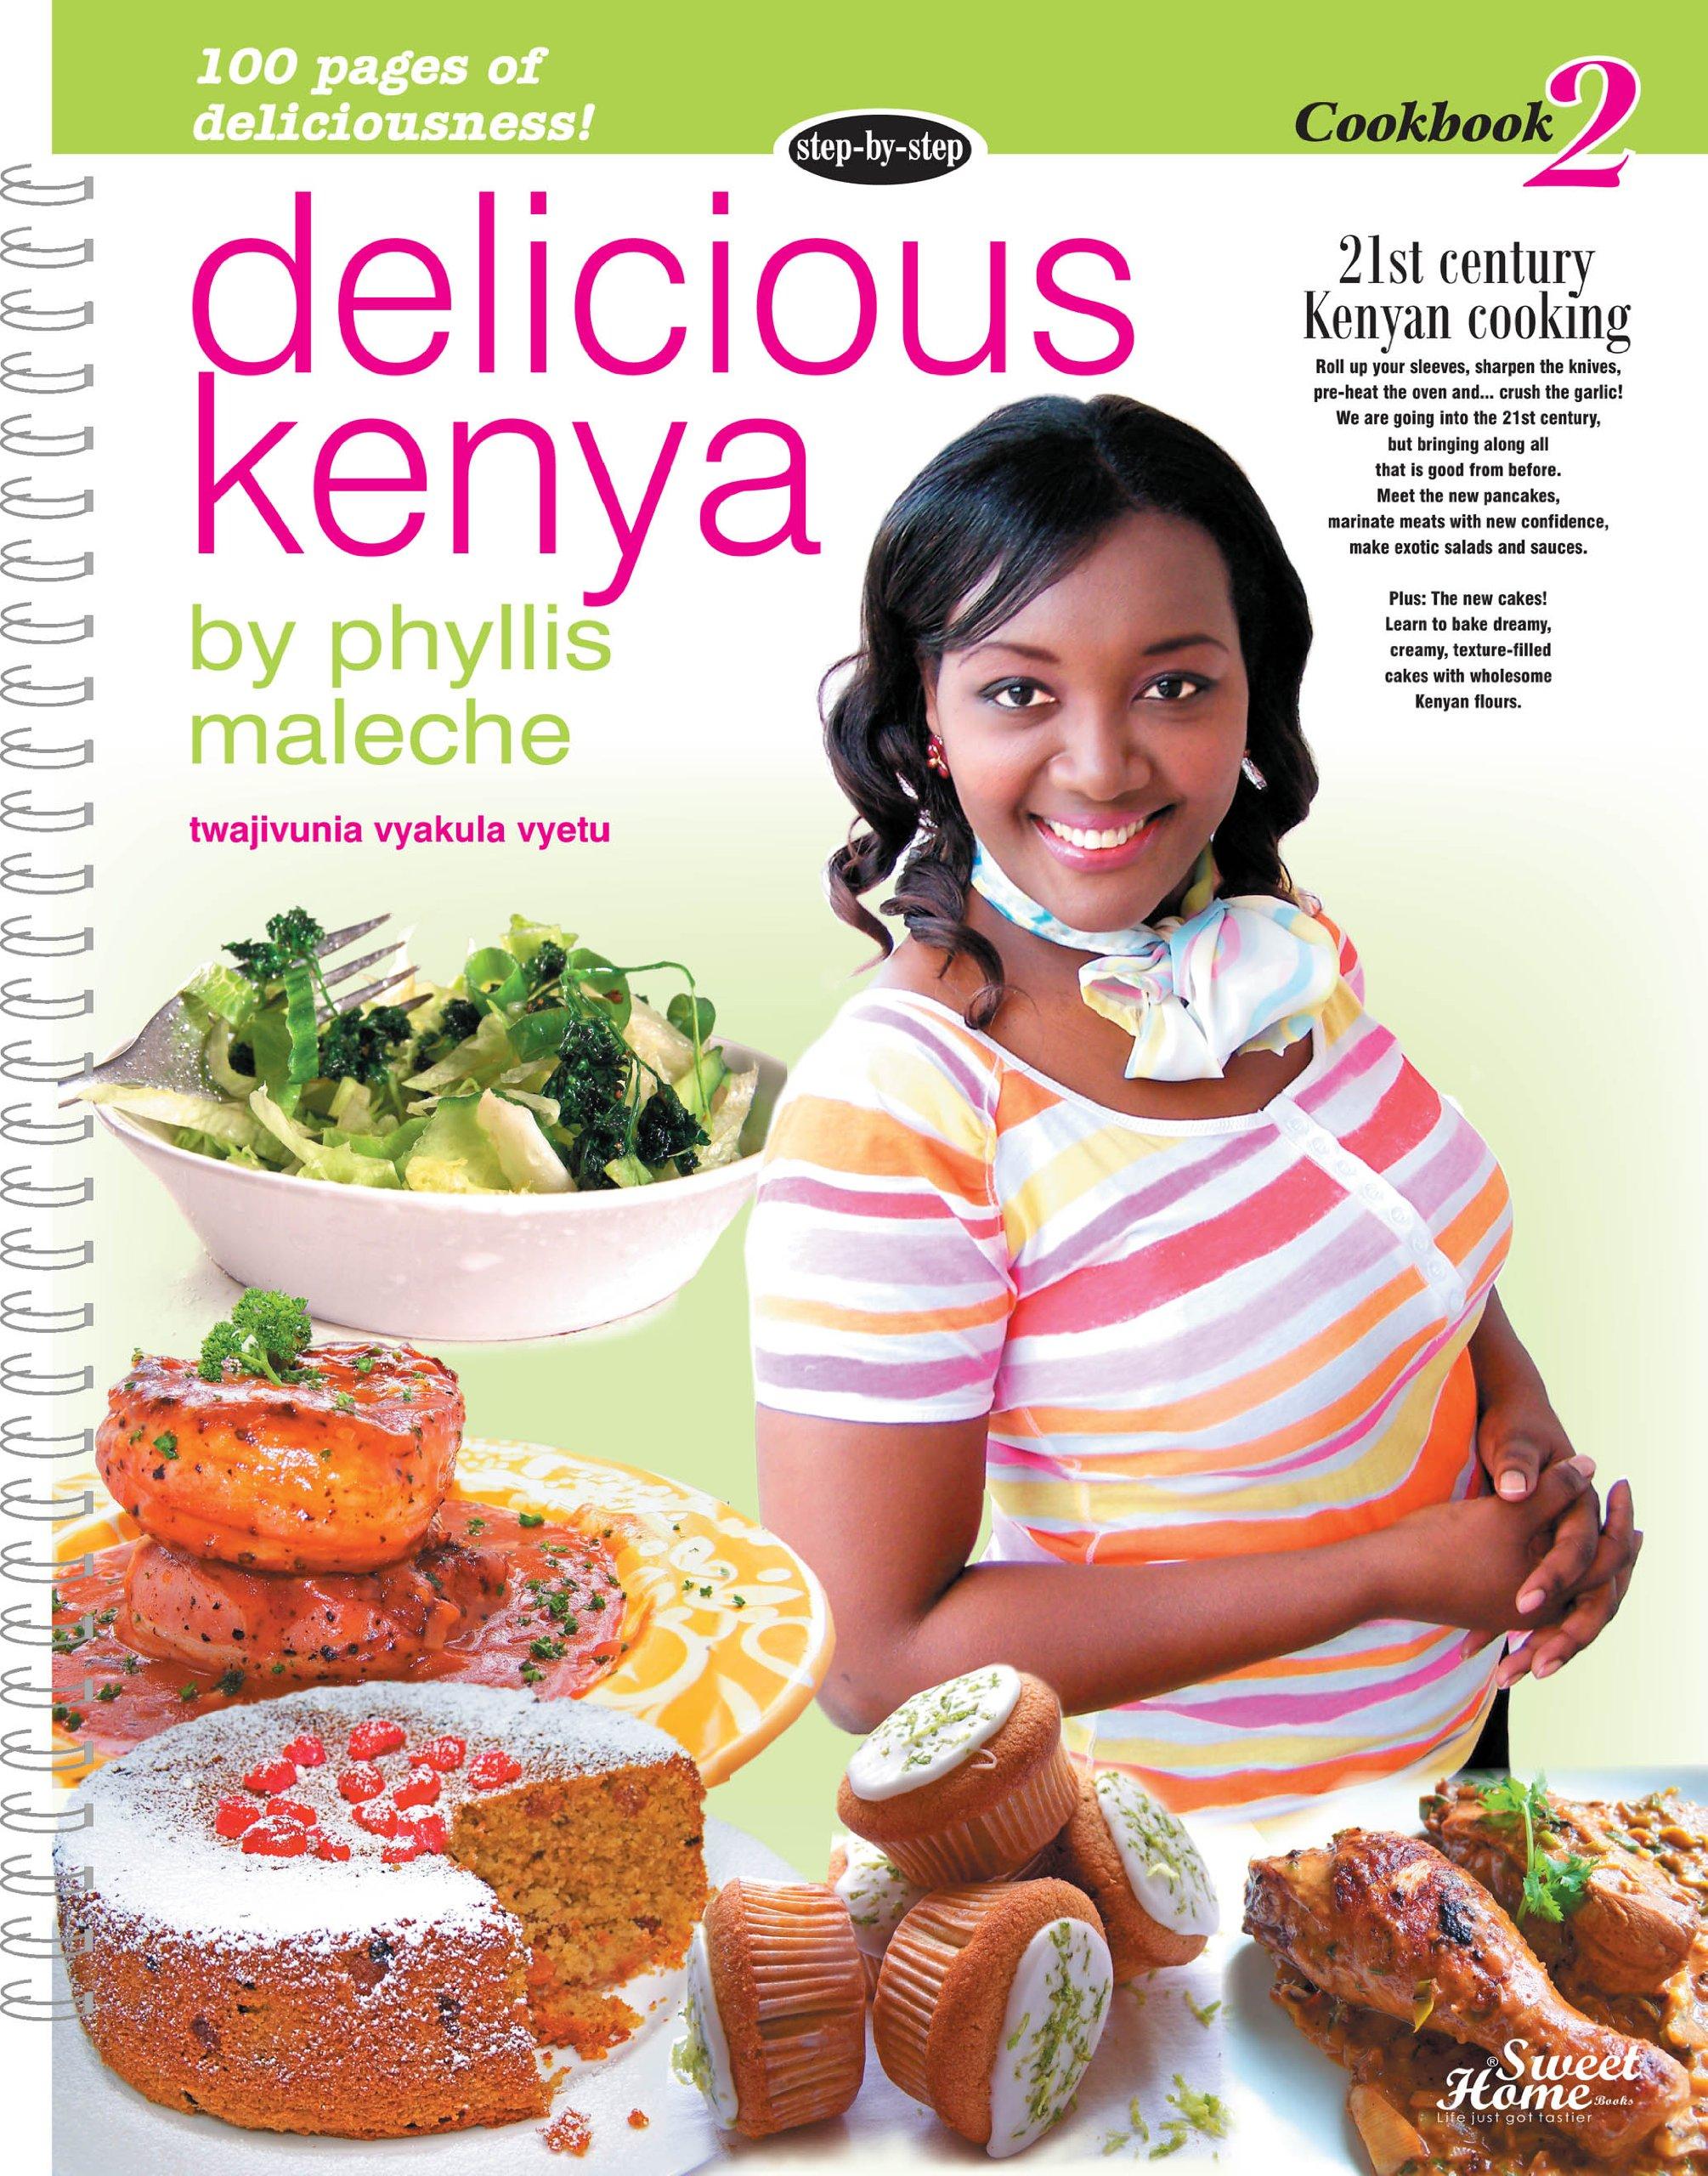 Delicious kenya cookbook 2 phyllis maleche anne marie nyamu delicious kenya cookbook 2 phyllis maleche anne marie nyamu 9789966160614 amazon books forumfinder Choice Image